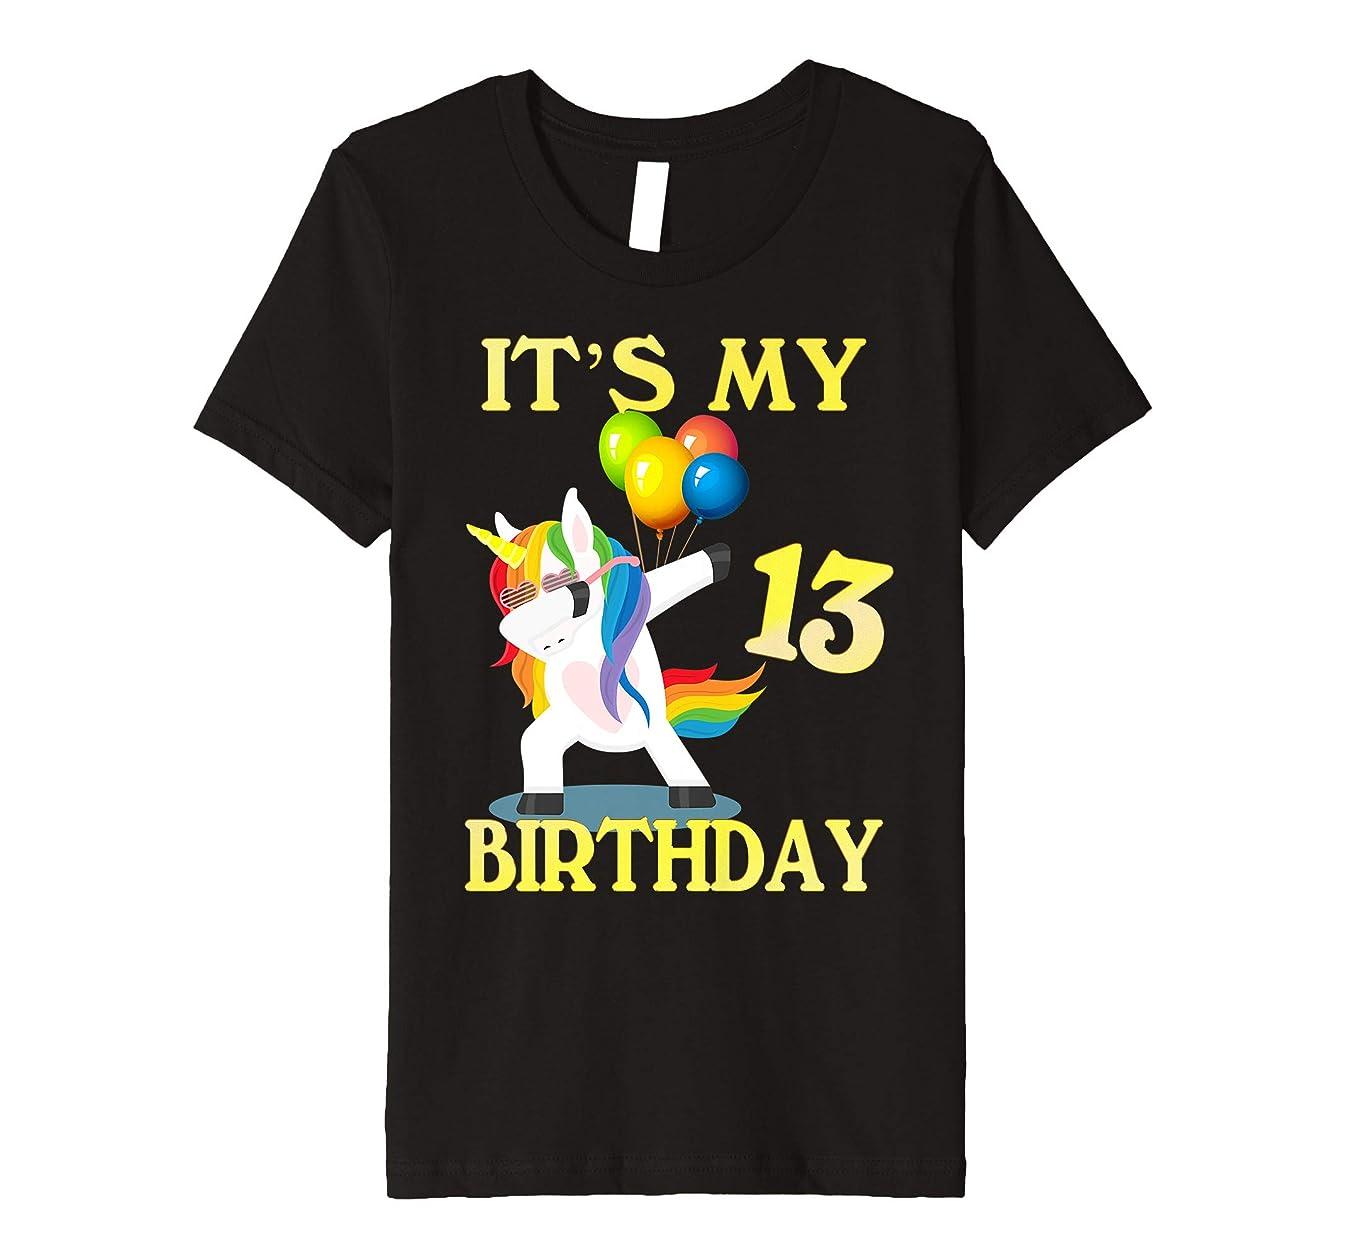 Kids Gift For 13 Years Old Shirt 13th It's My Birthday Unicorn